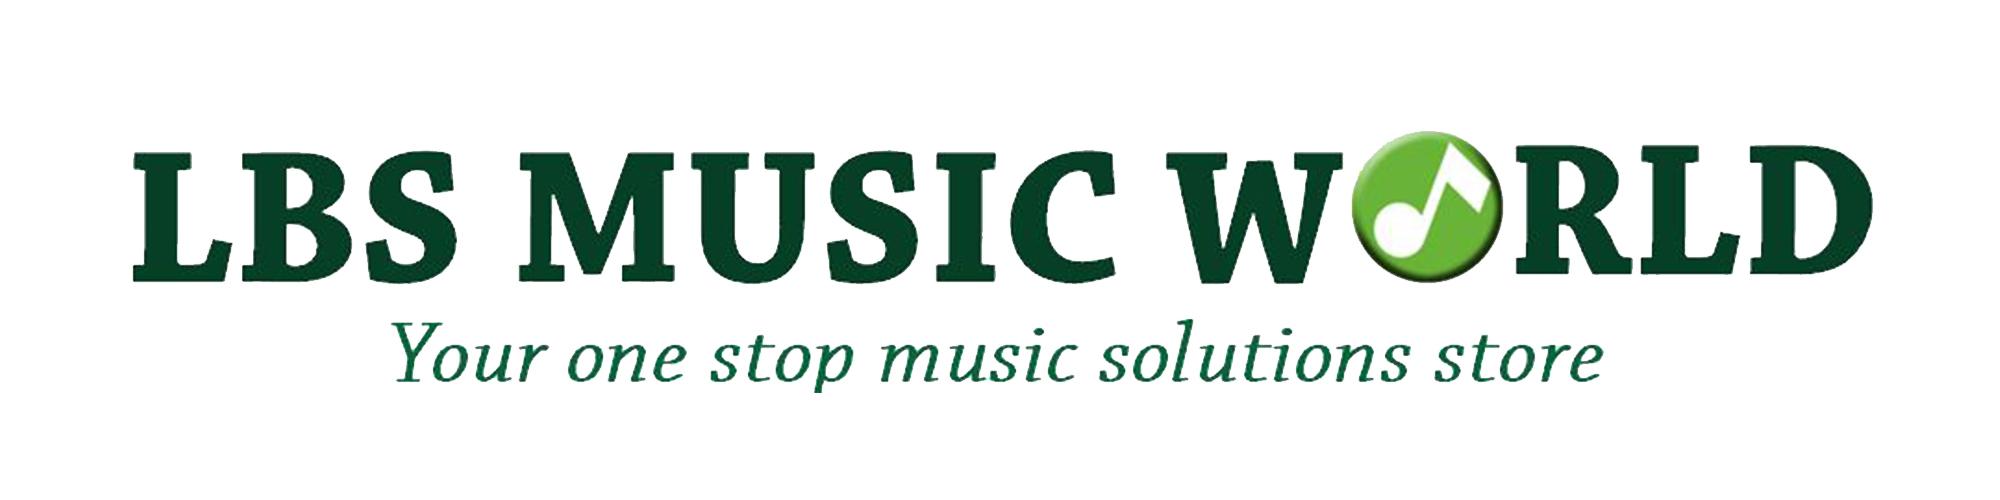 LBS MUSIC WORLD